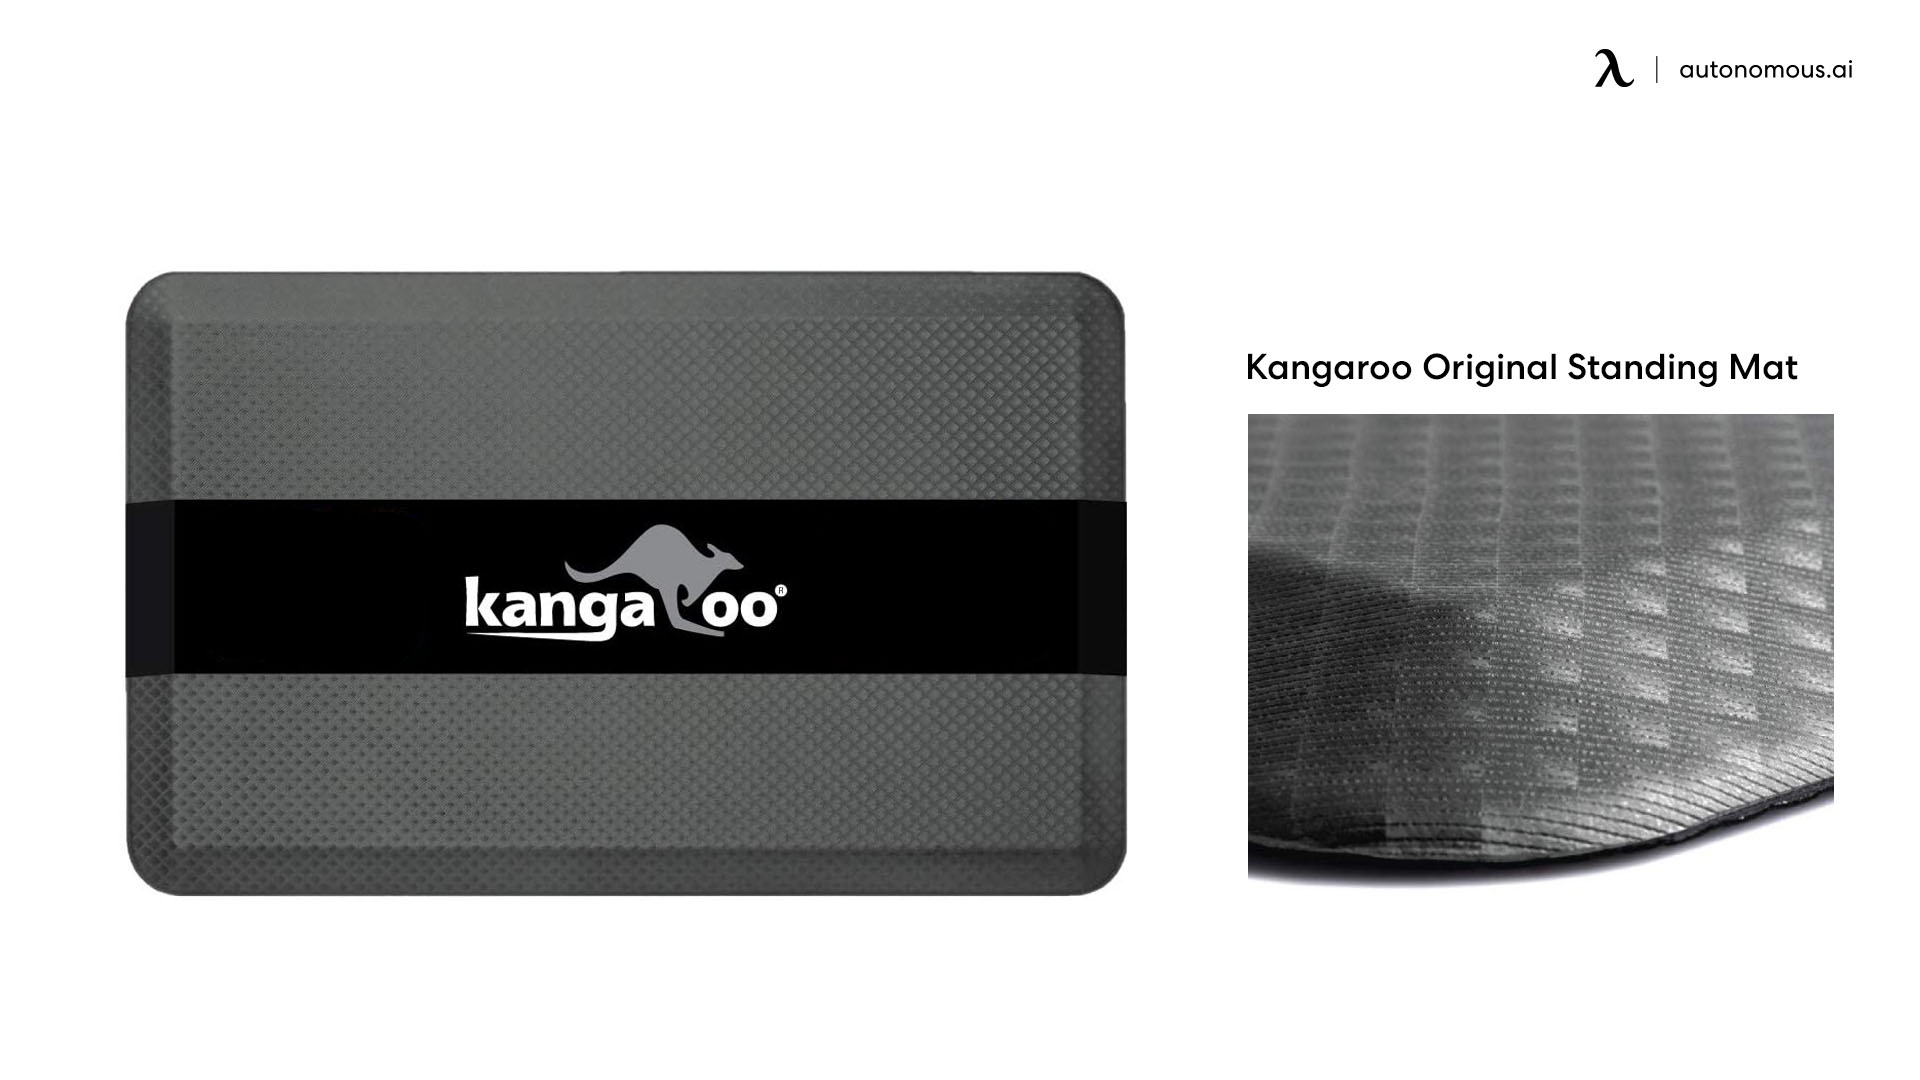 Kangaroo Original Standing Desk Mat